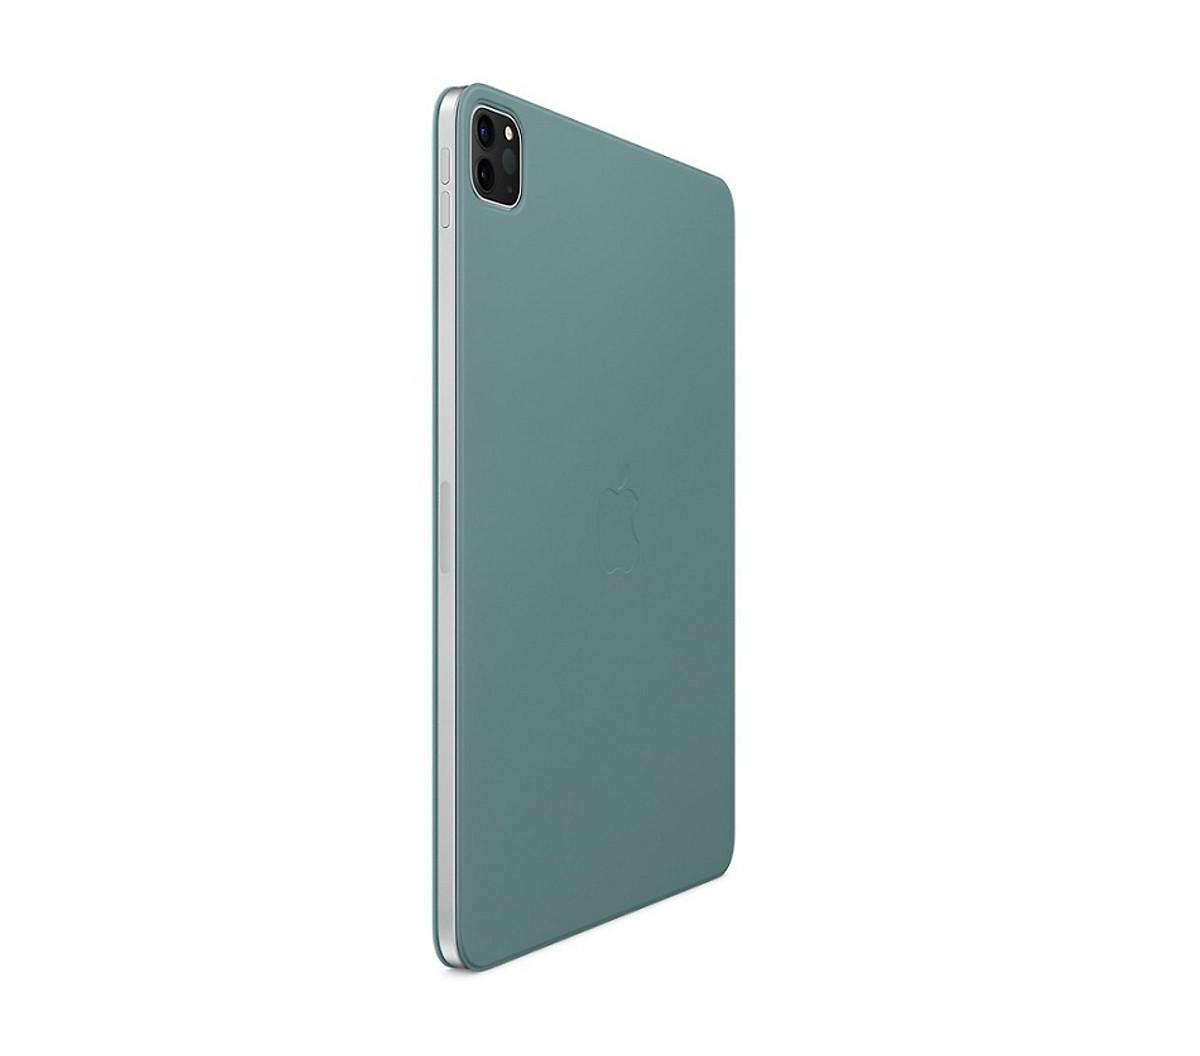 bao da ipad pro 11 2020 smart cover